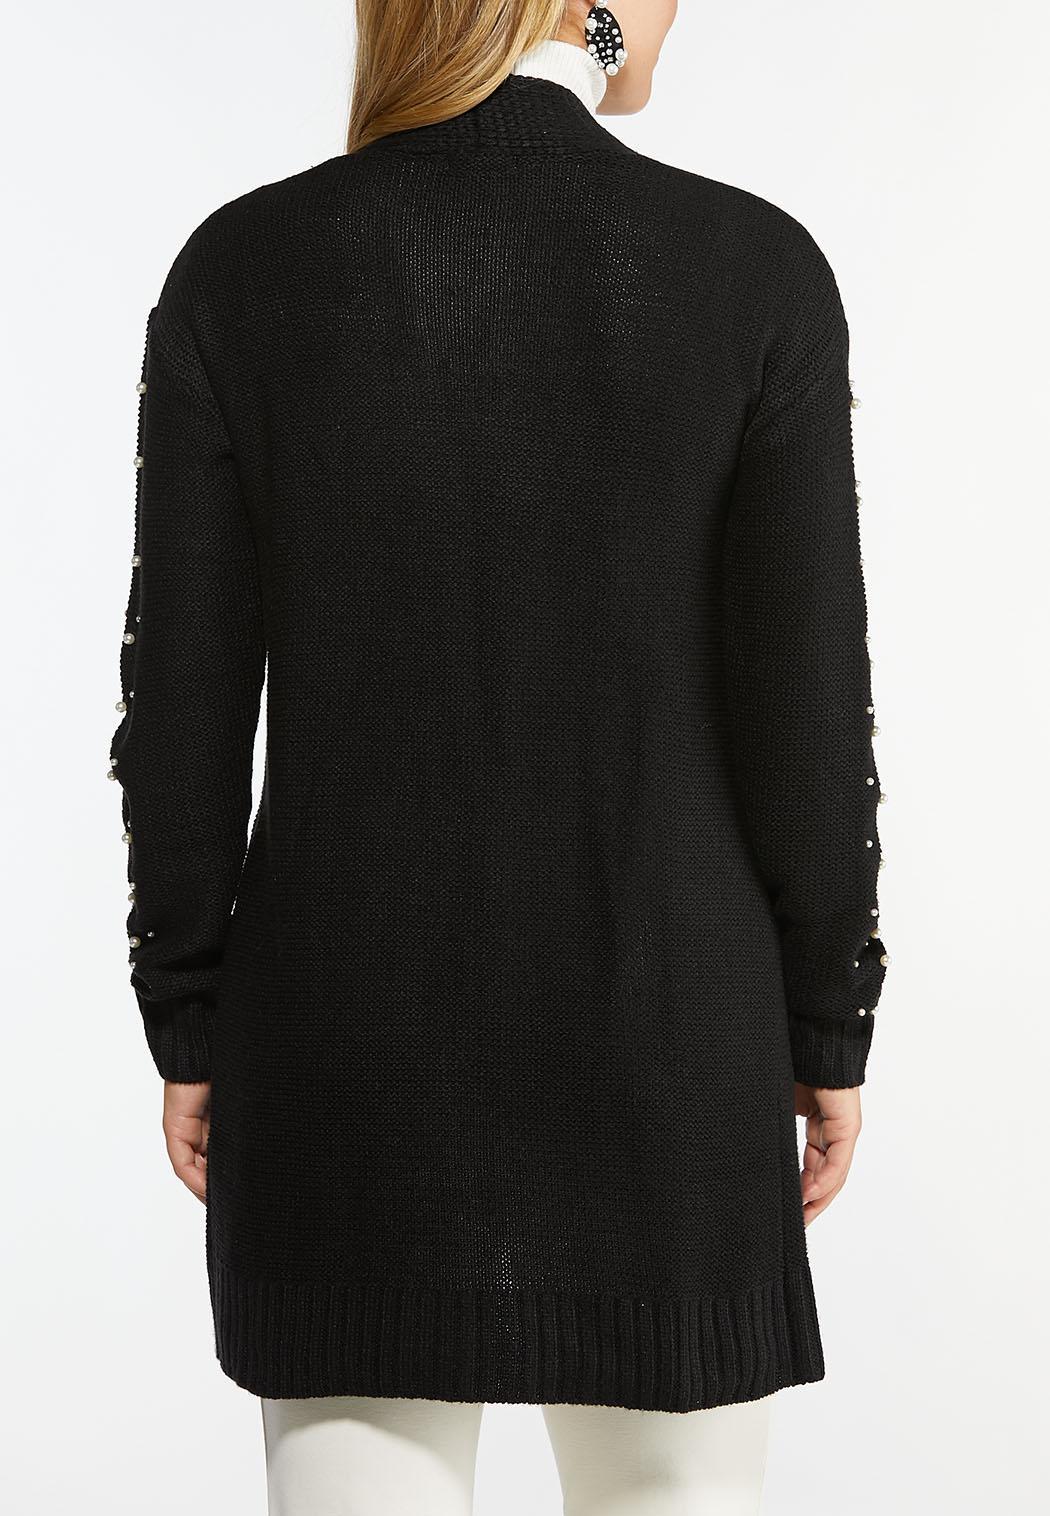 Pearl Embellished Cardigan Sweater (Item #44461030)